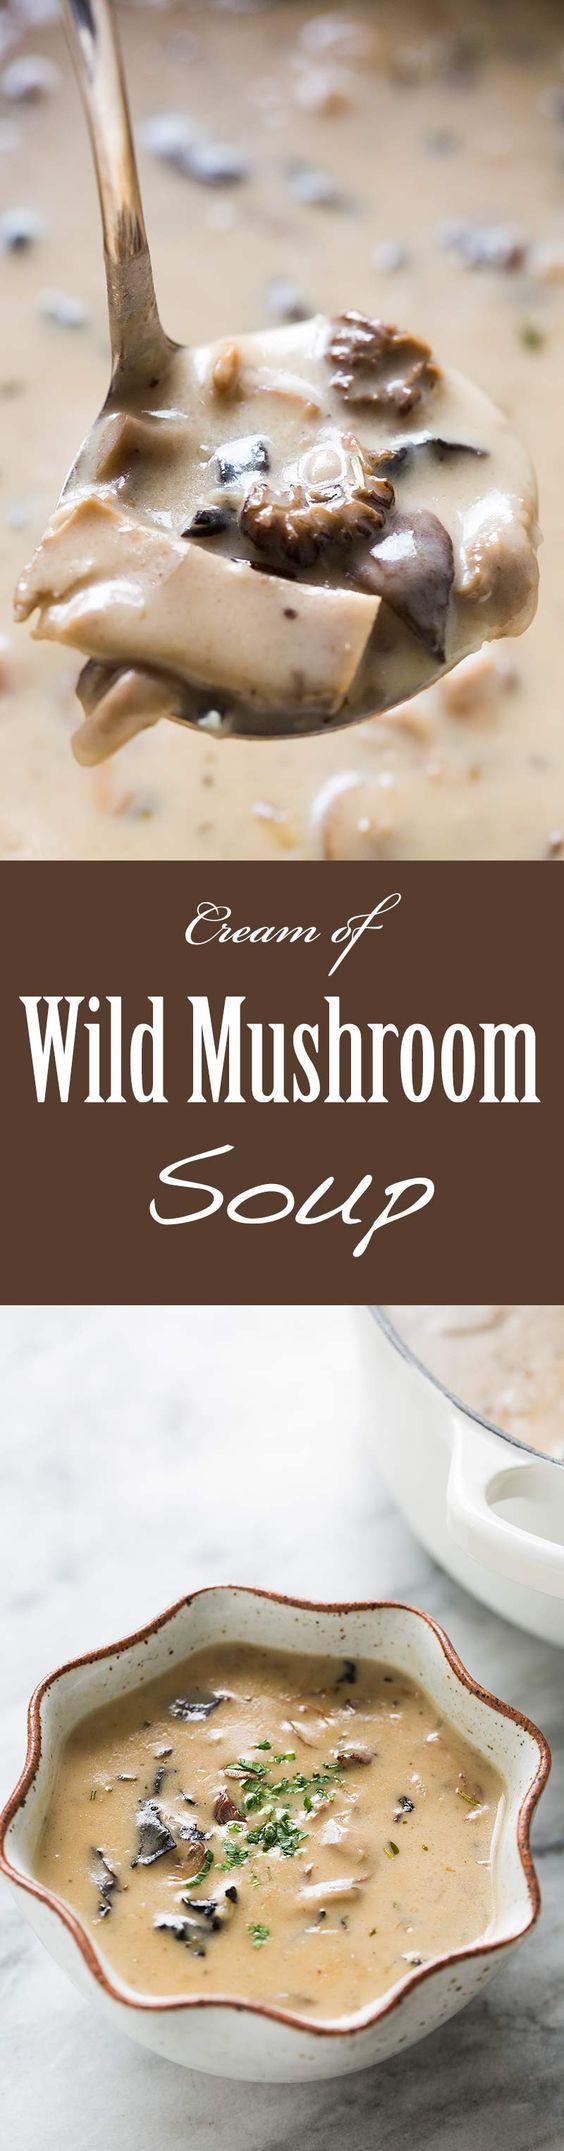 The 25 best wild mushroom soup ideas on pinterest wild mushroom bisque recipe gluten free - Wild mushrooms business ideas ...